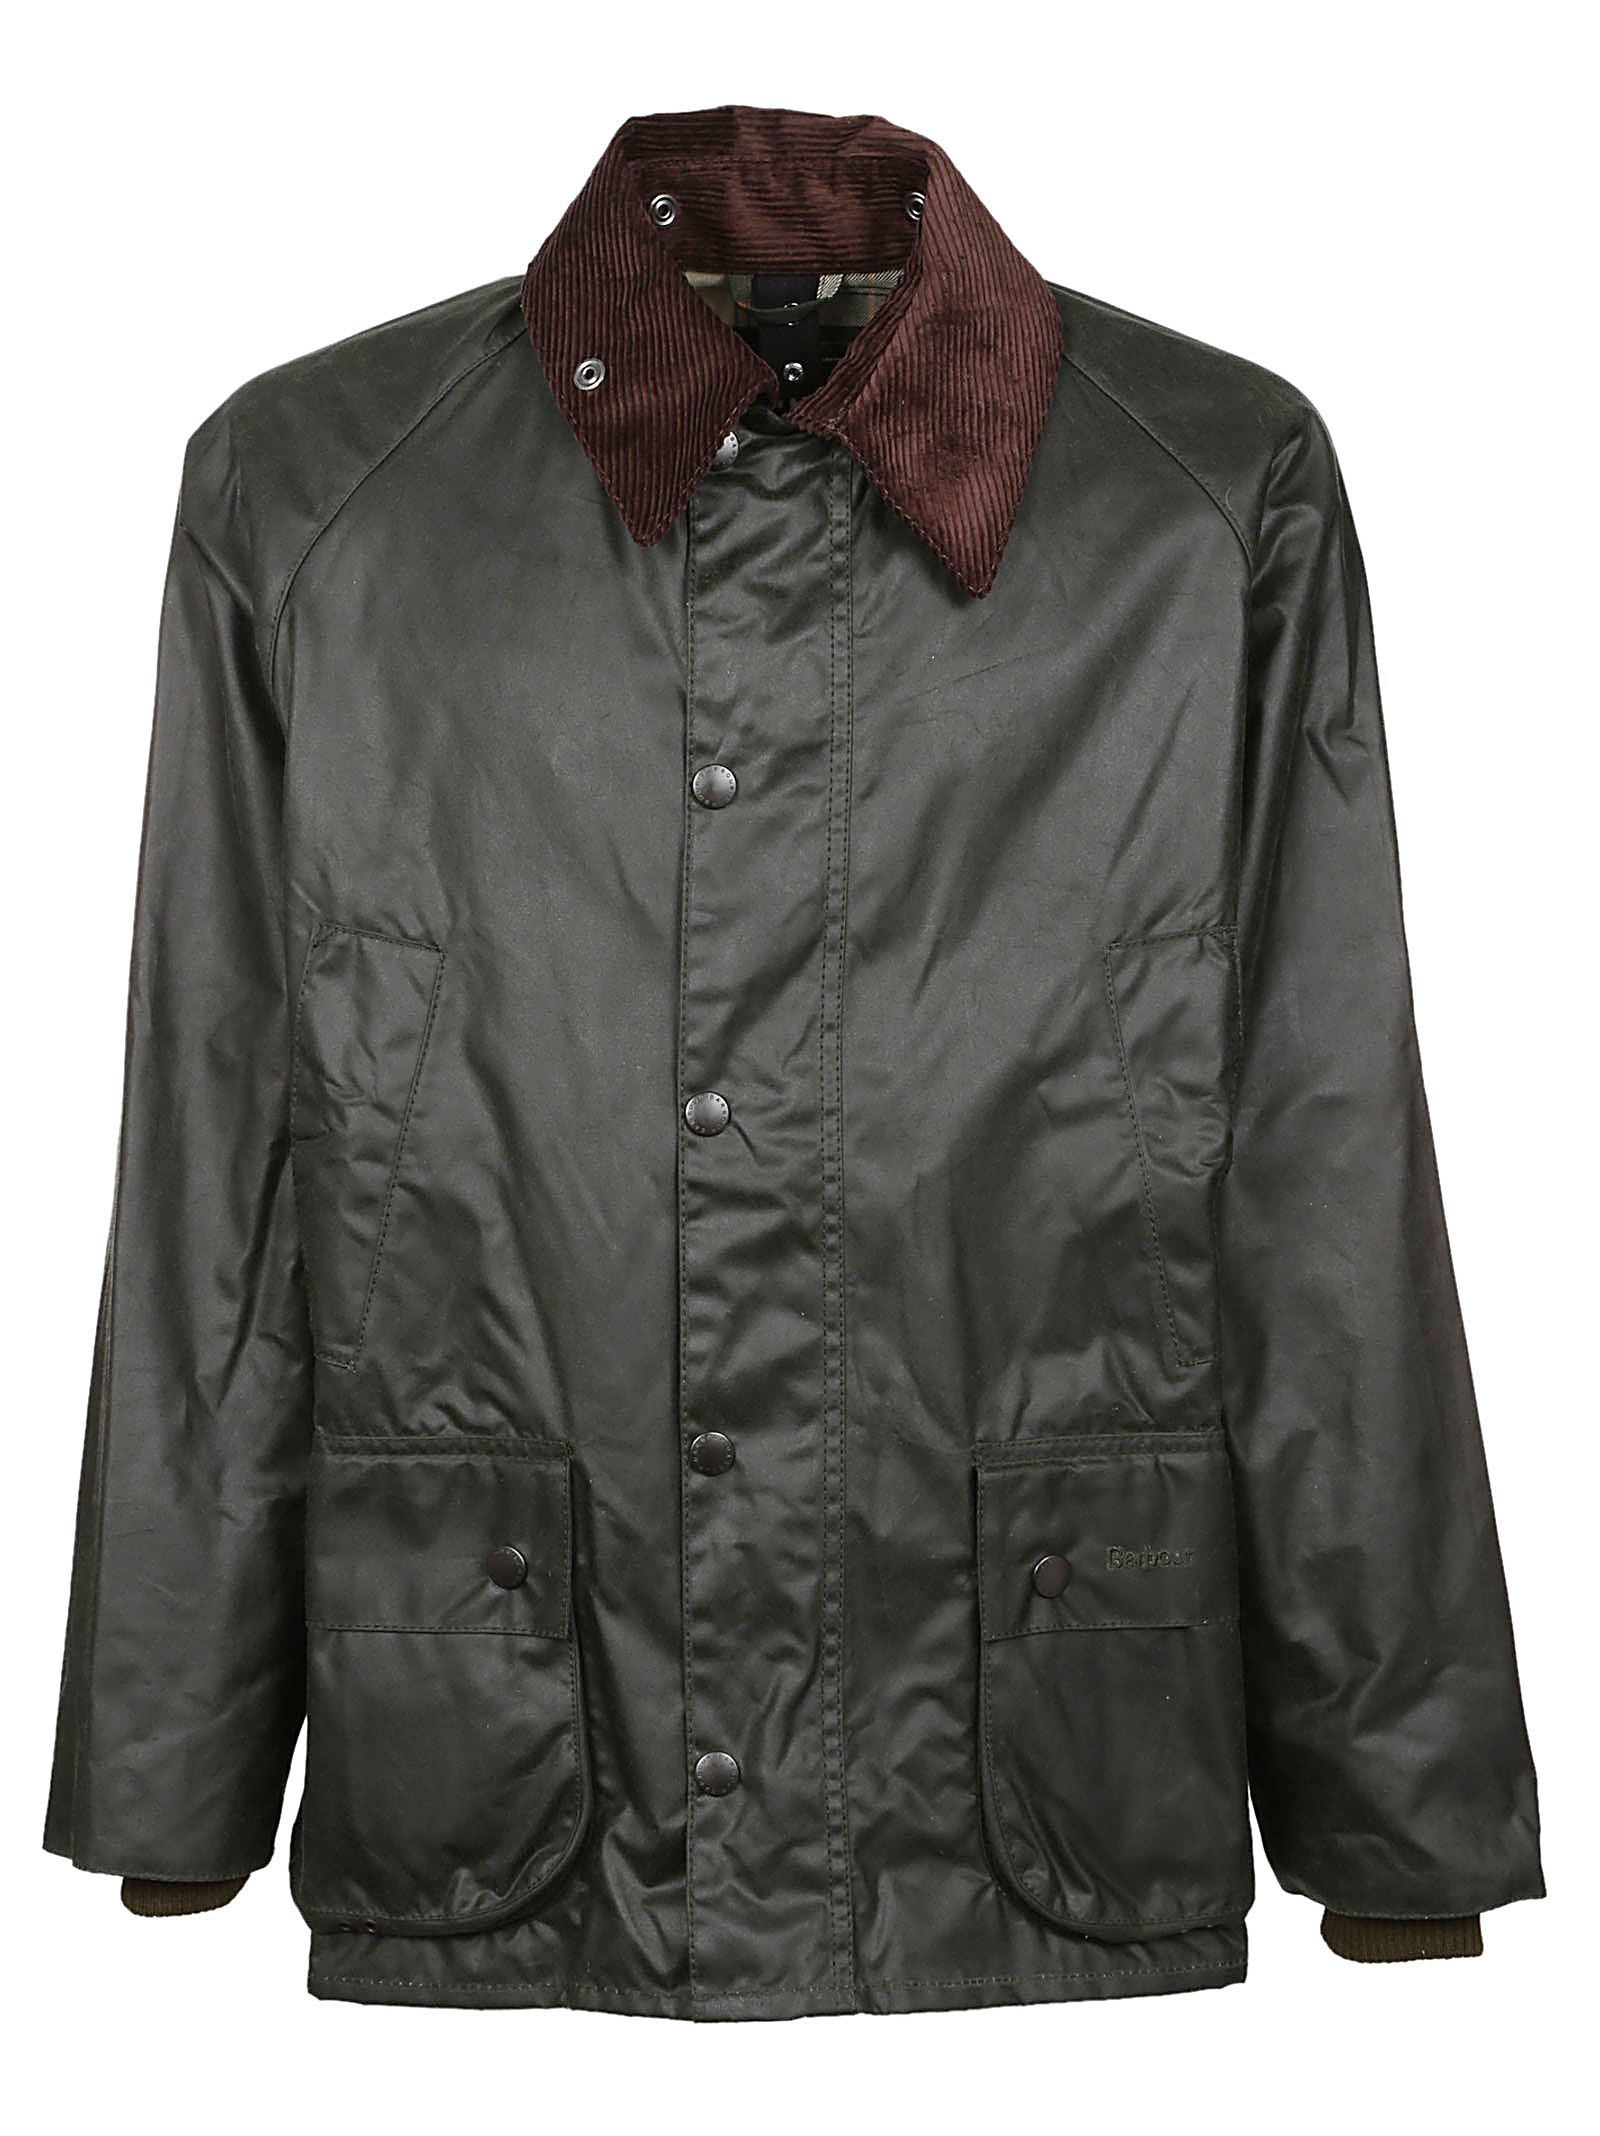 Barbour Ashby Jacket